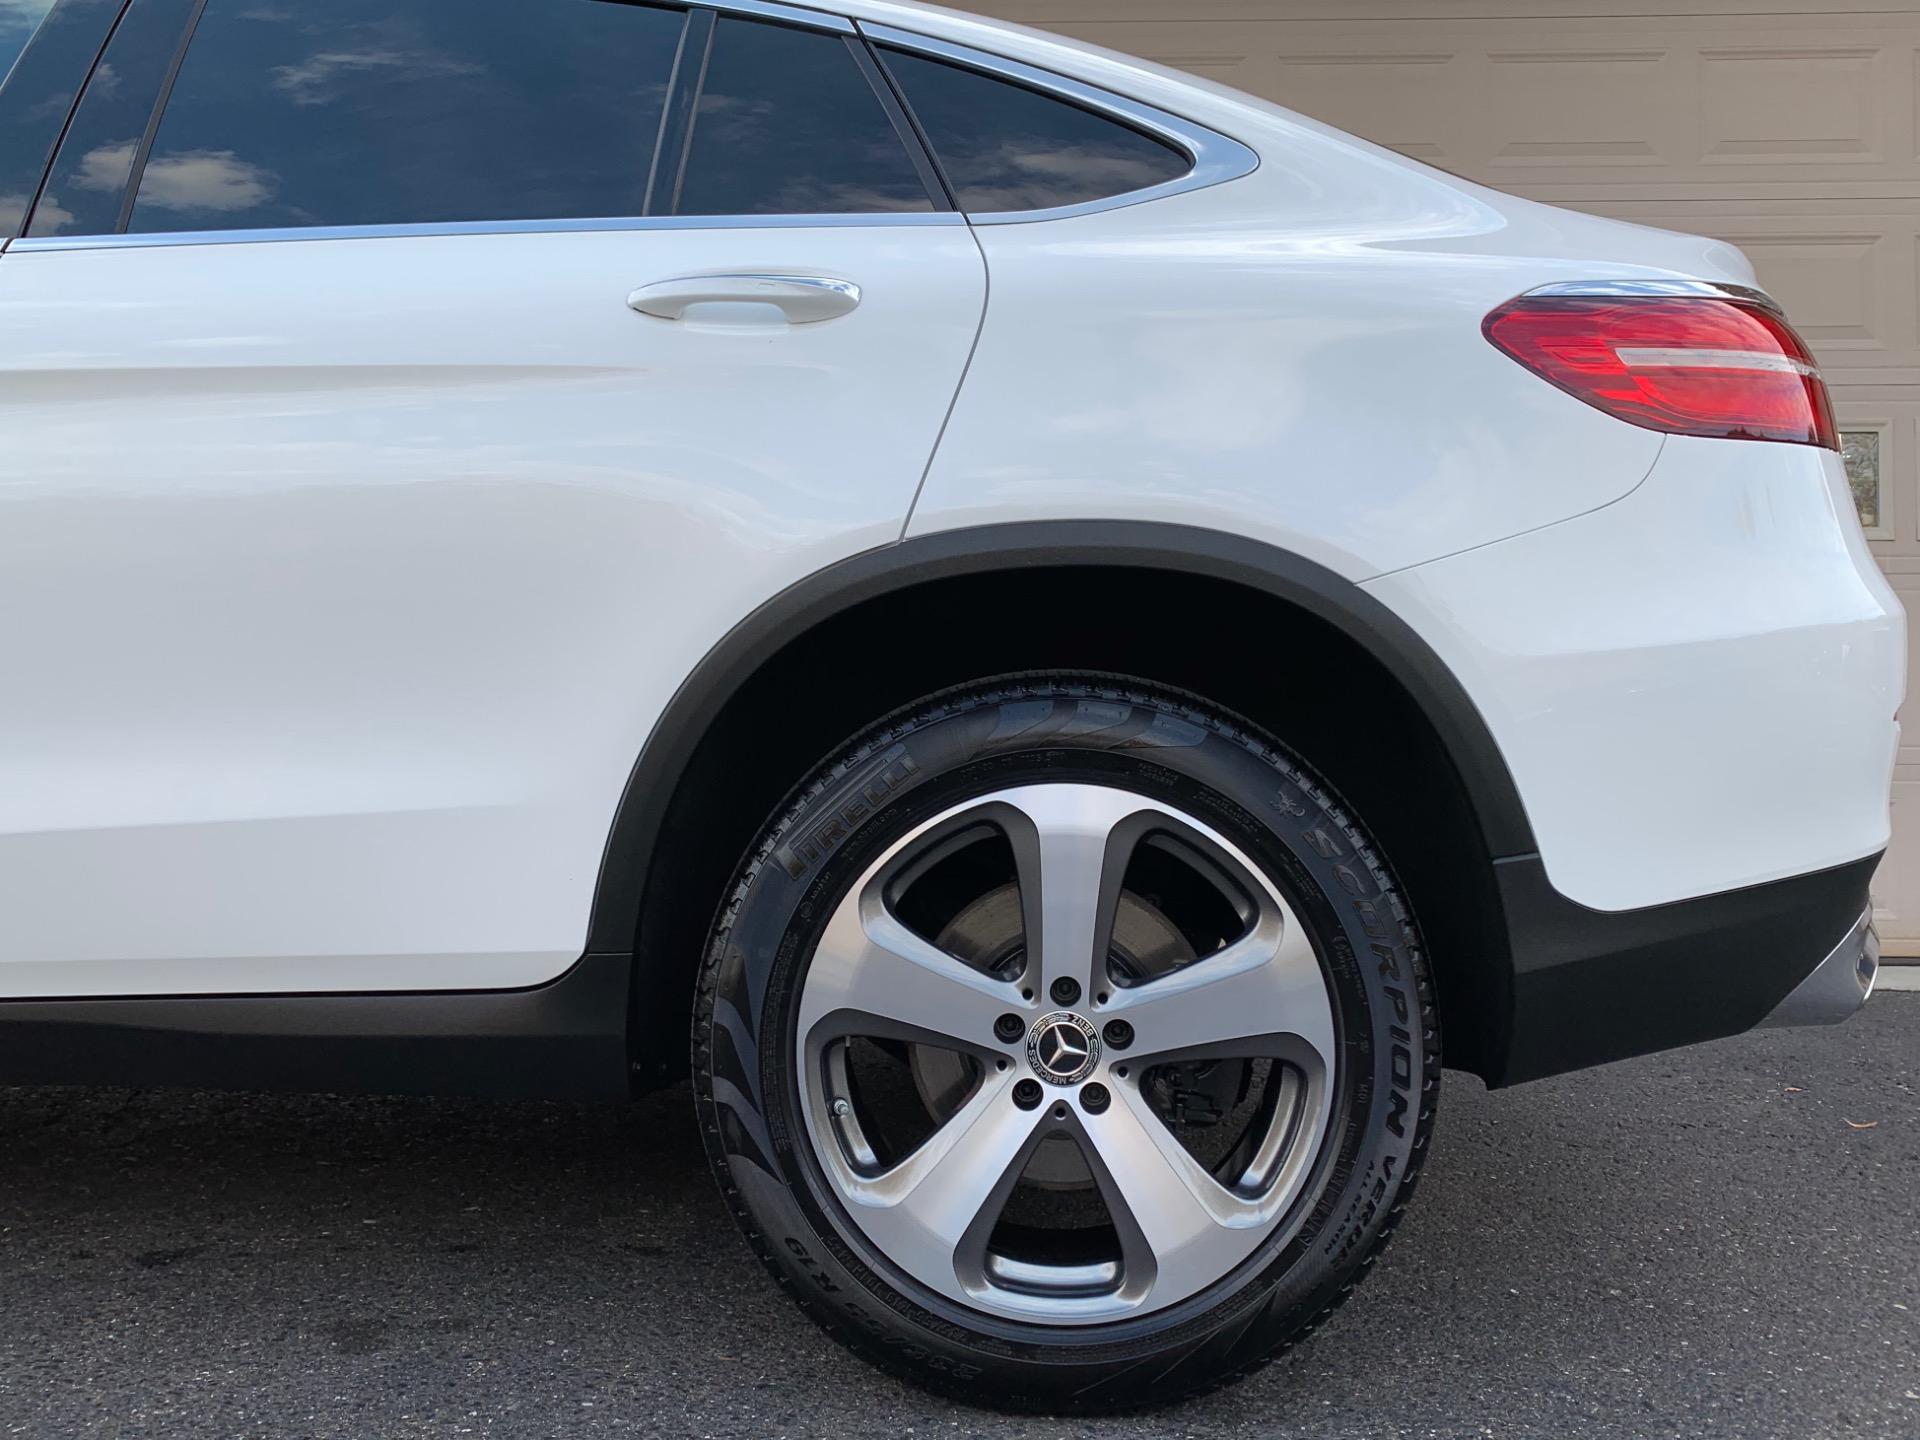 Used-2018-Mercedes-Benz-GLC-GLC-300-4MATIC-Coupe